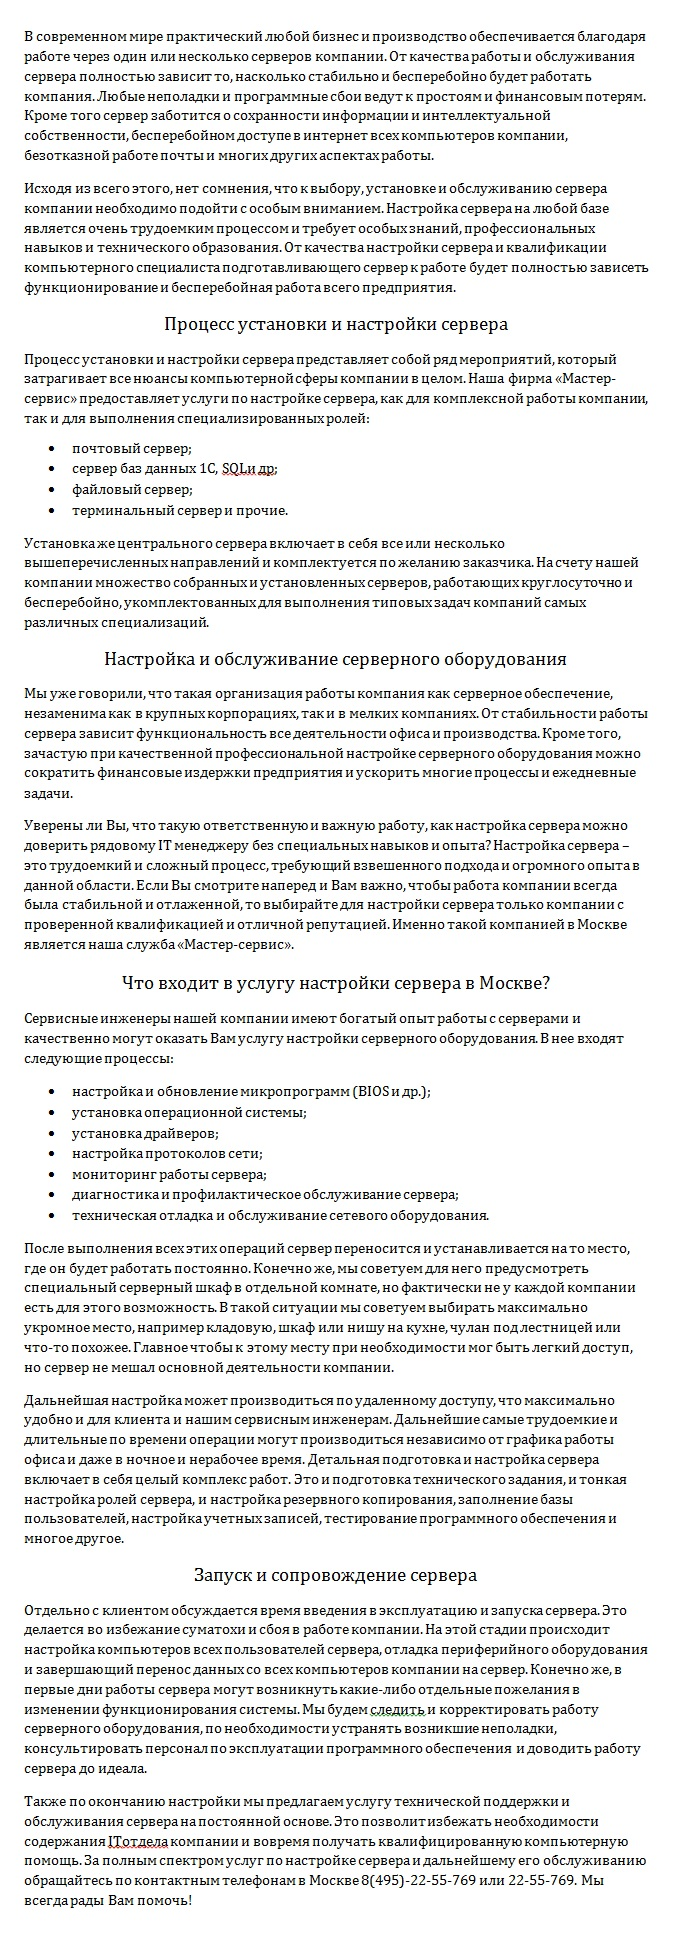 IT. Настройка сервера в Москве